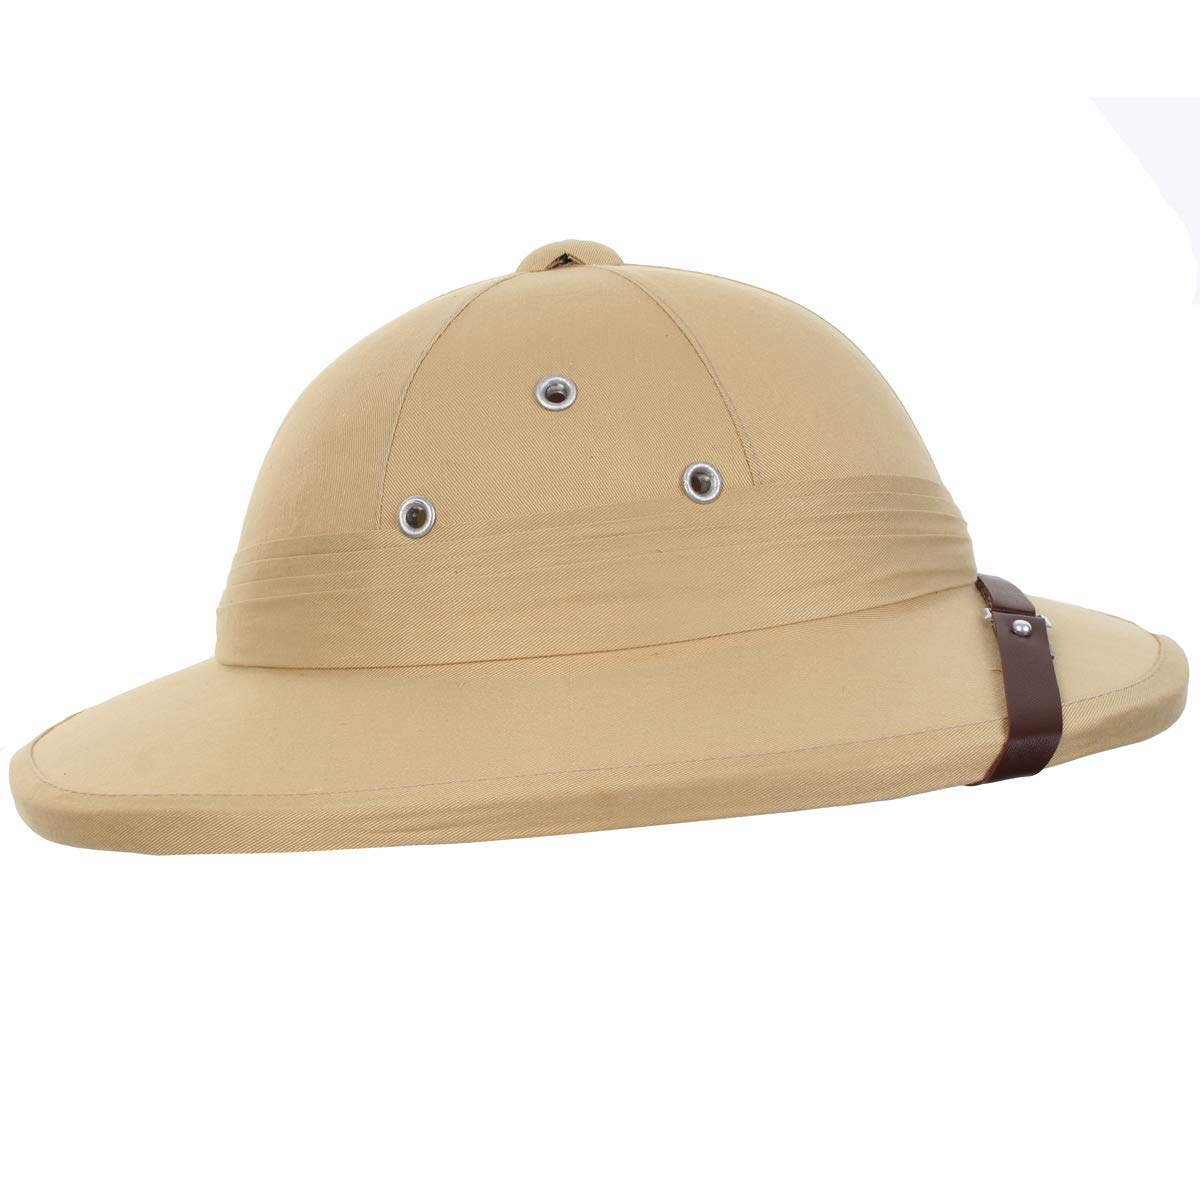 f23869609d328 Amazon.com  French Army Tropical Pith Helmet in British Khaki  Clothing